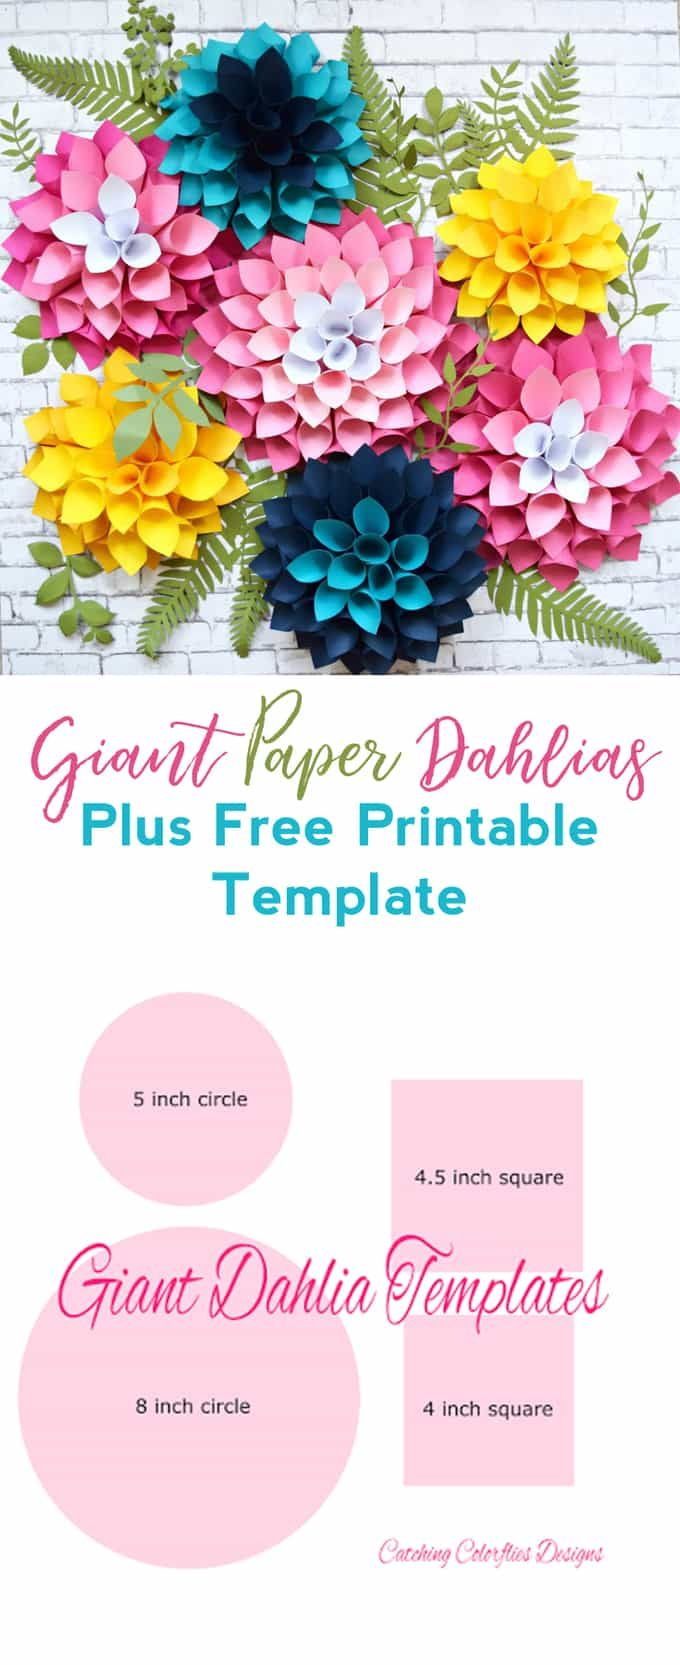 Step By Step Easy Giant Paper Dahlia Tutorial Burlap Blue Craft